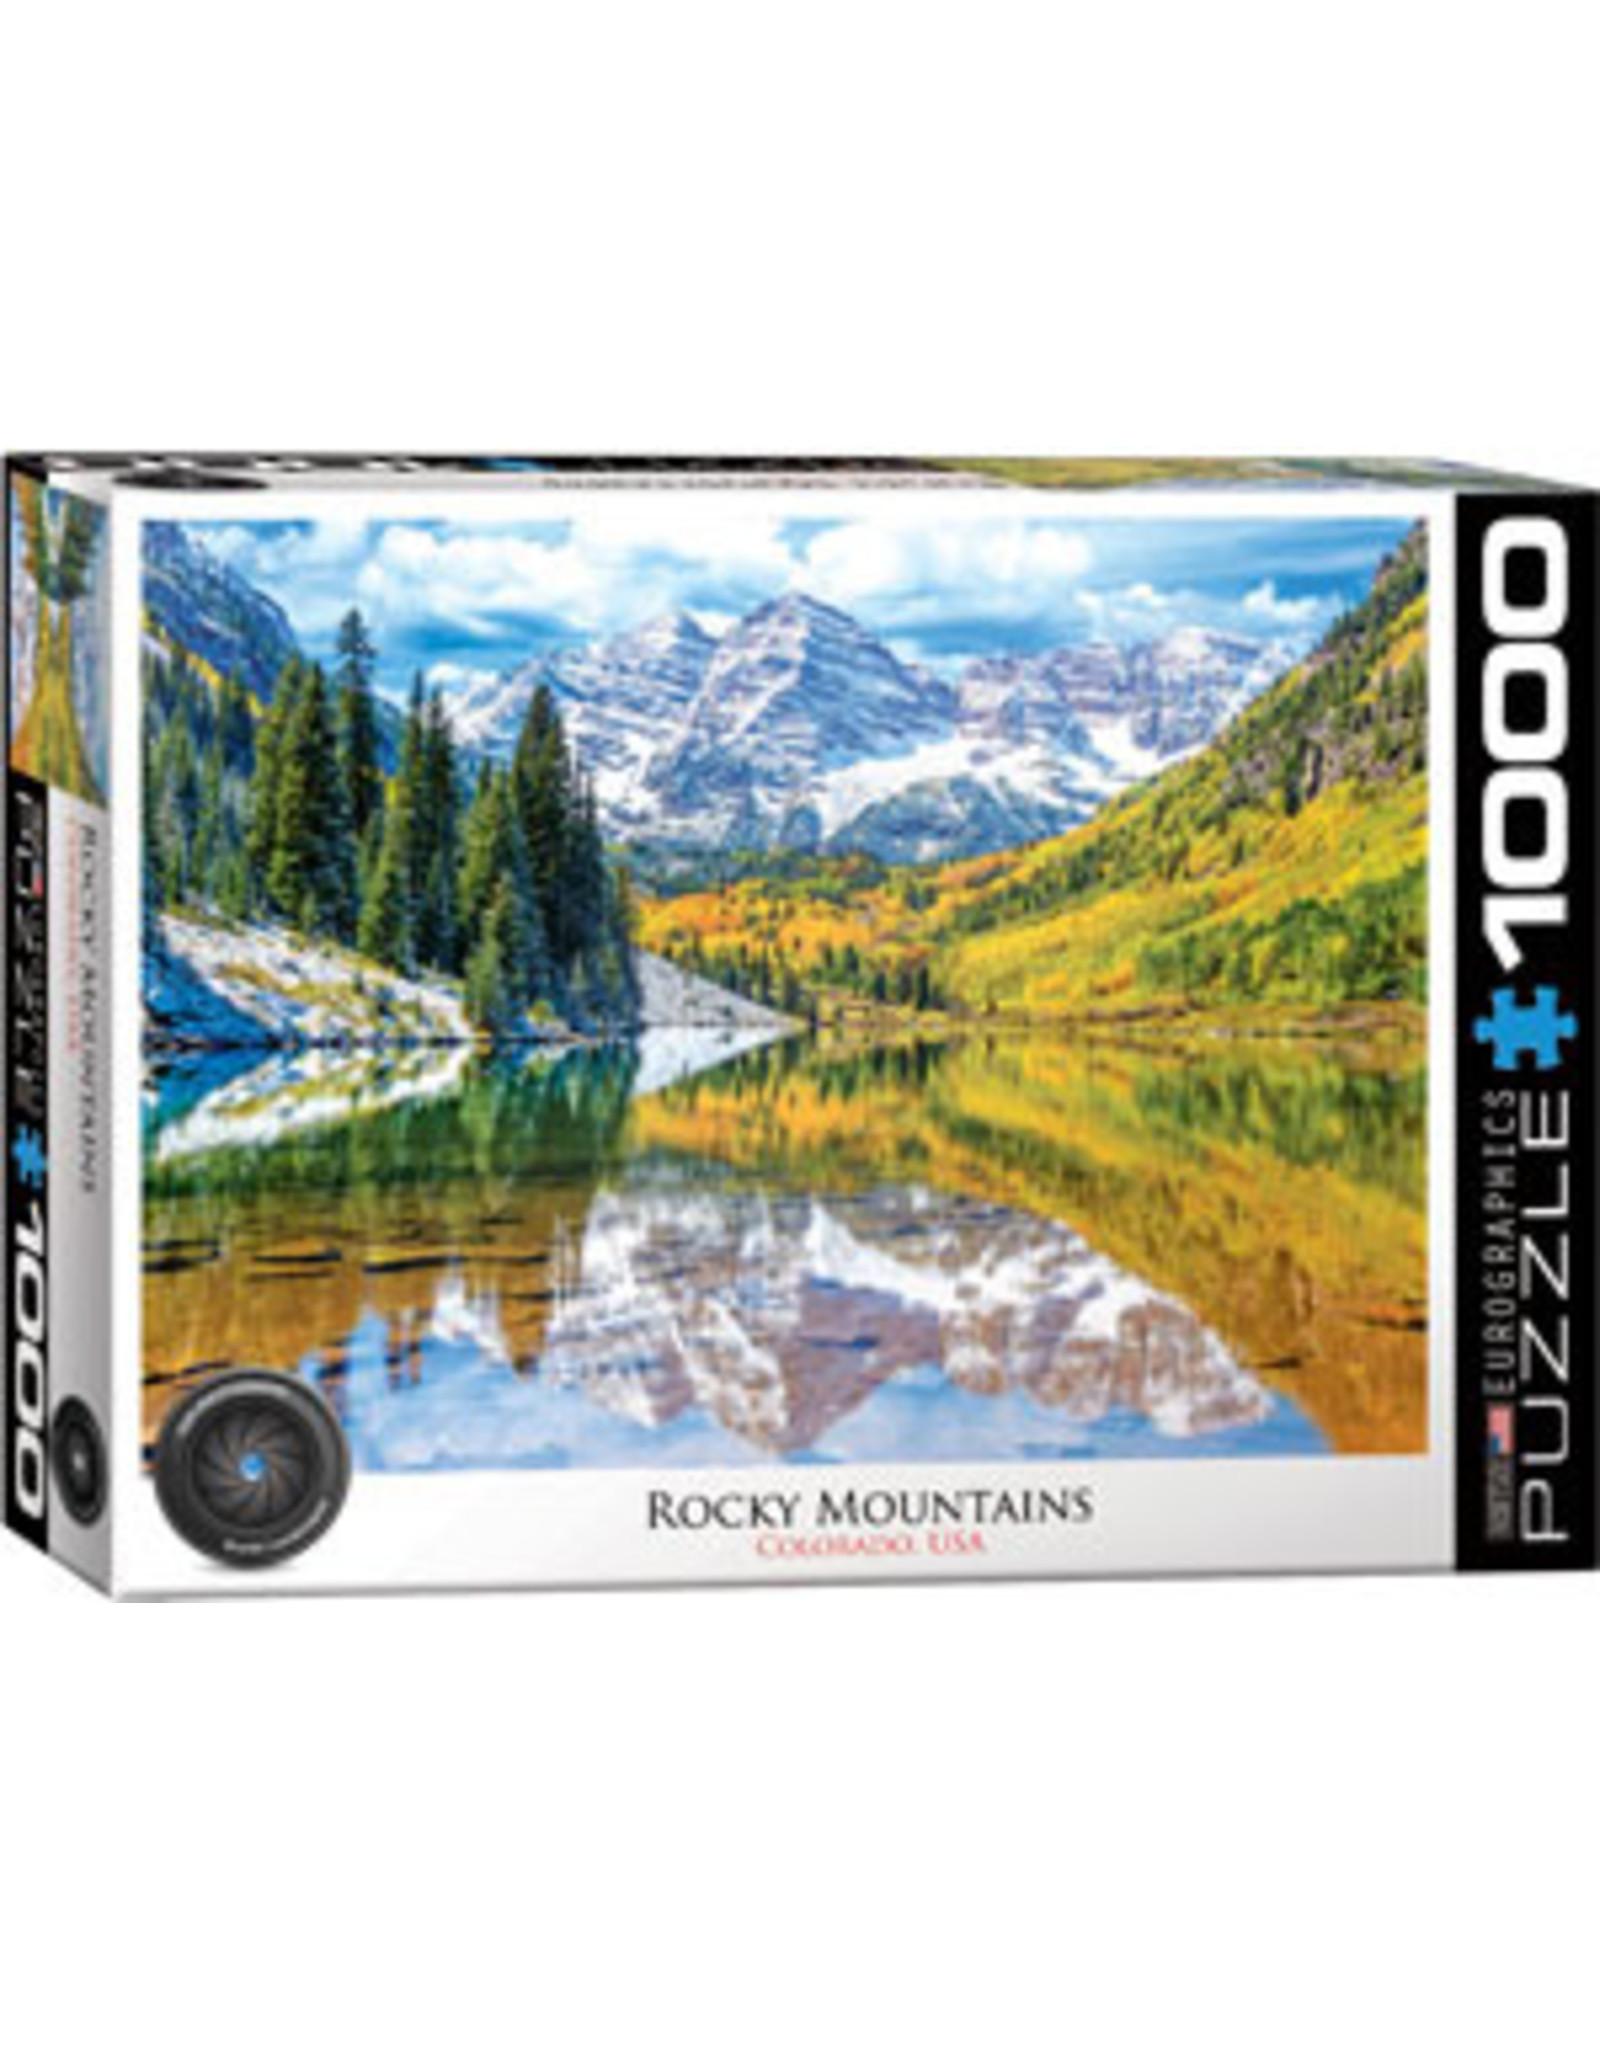 Eurographics Rocky Mountains, Colorado